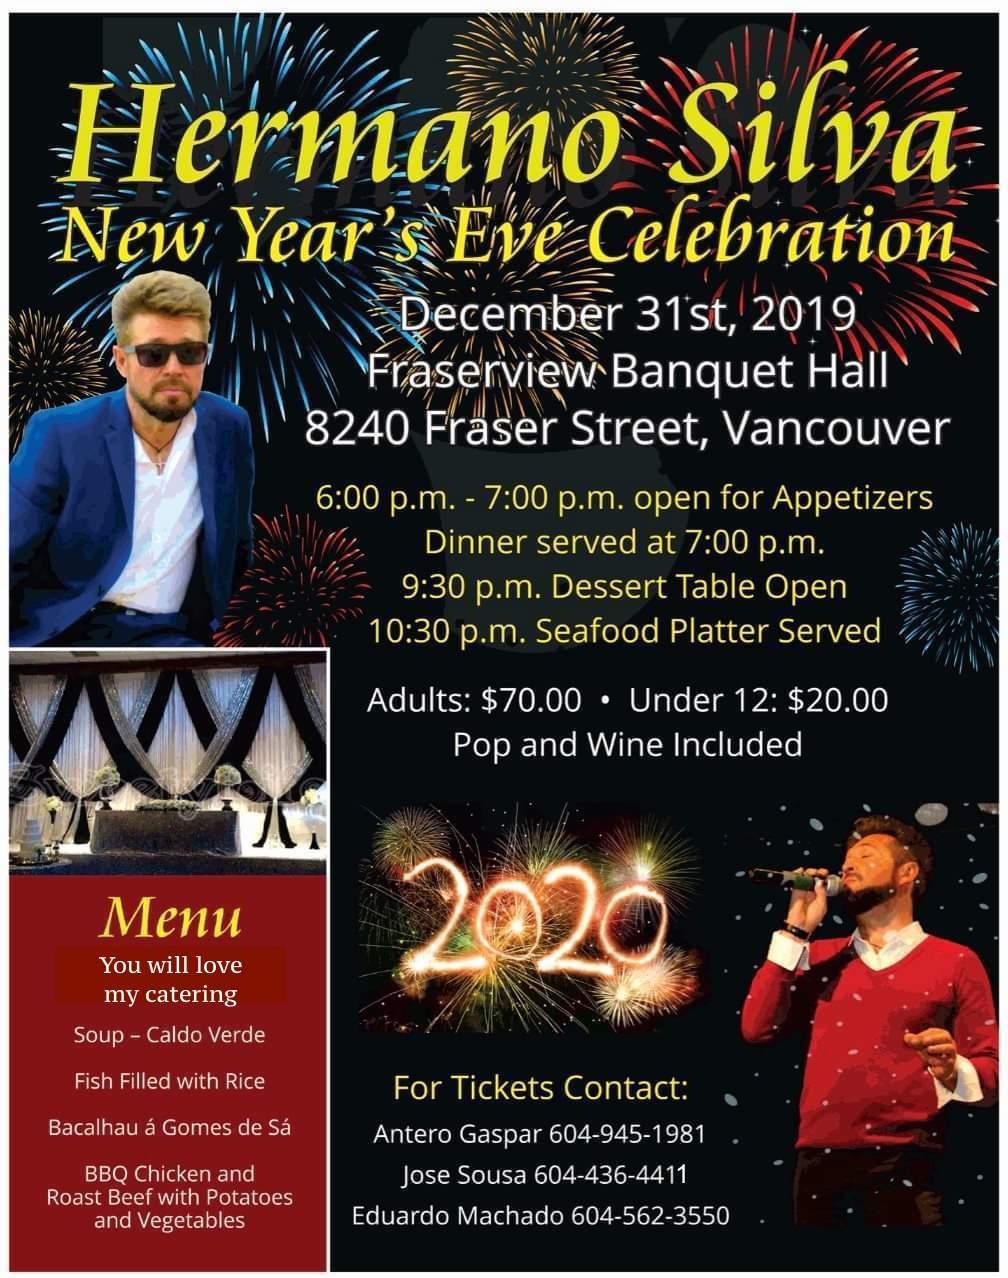 Hermano Silva New Year's Eve Celebration